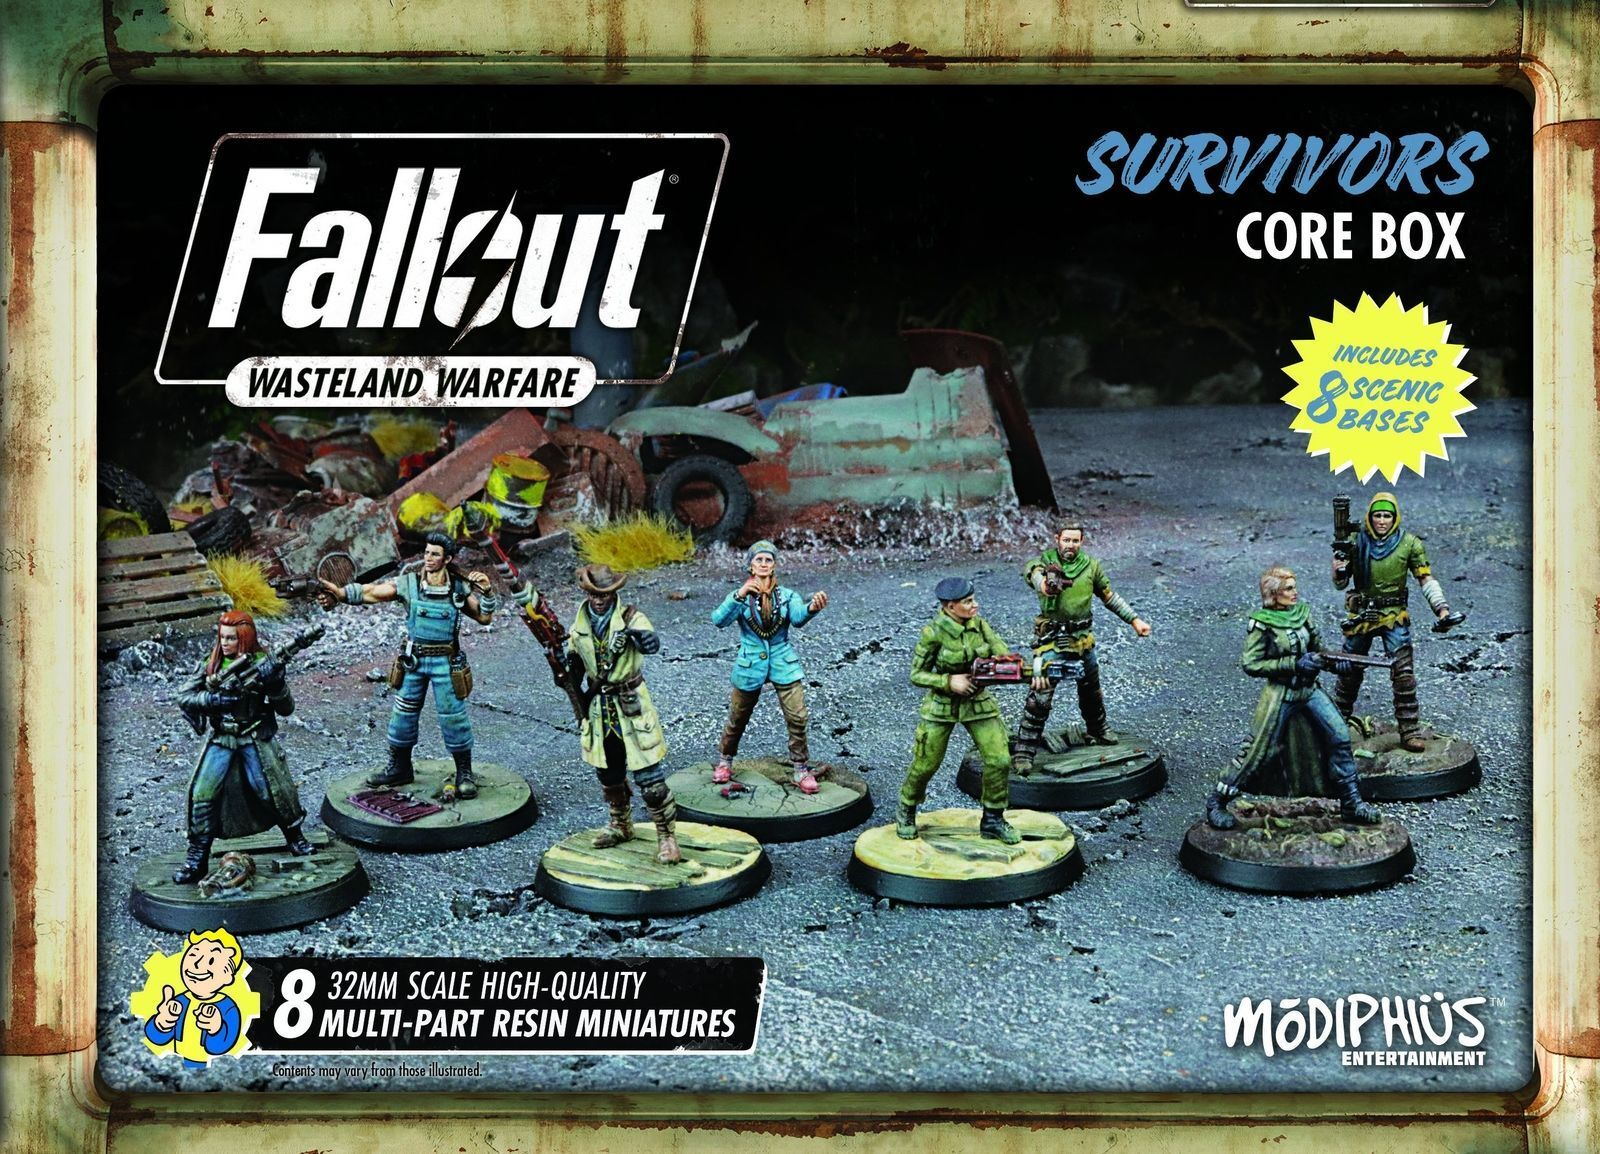 Fallout Wasteland Warfare Survivors Core Faction Box Miniatures Modiphius